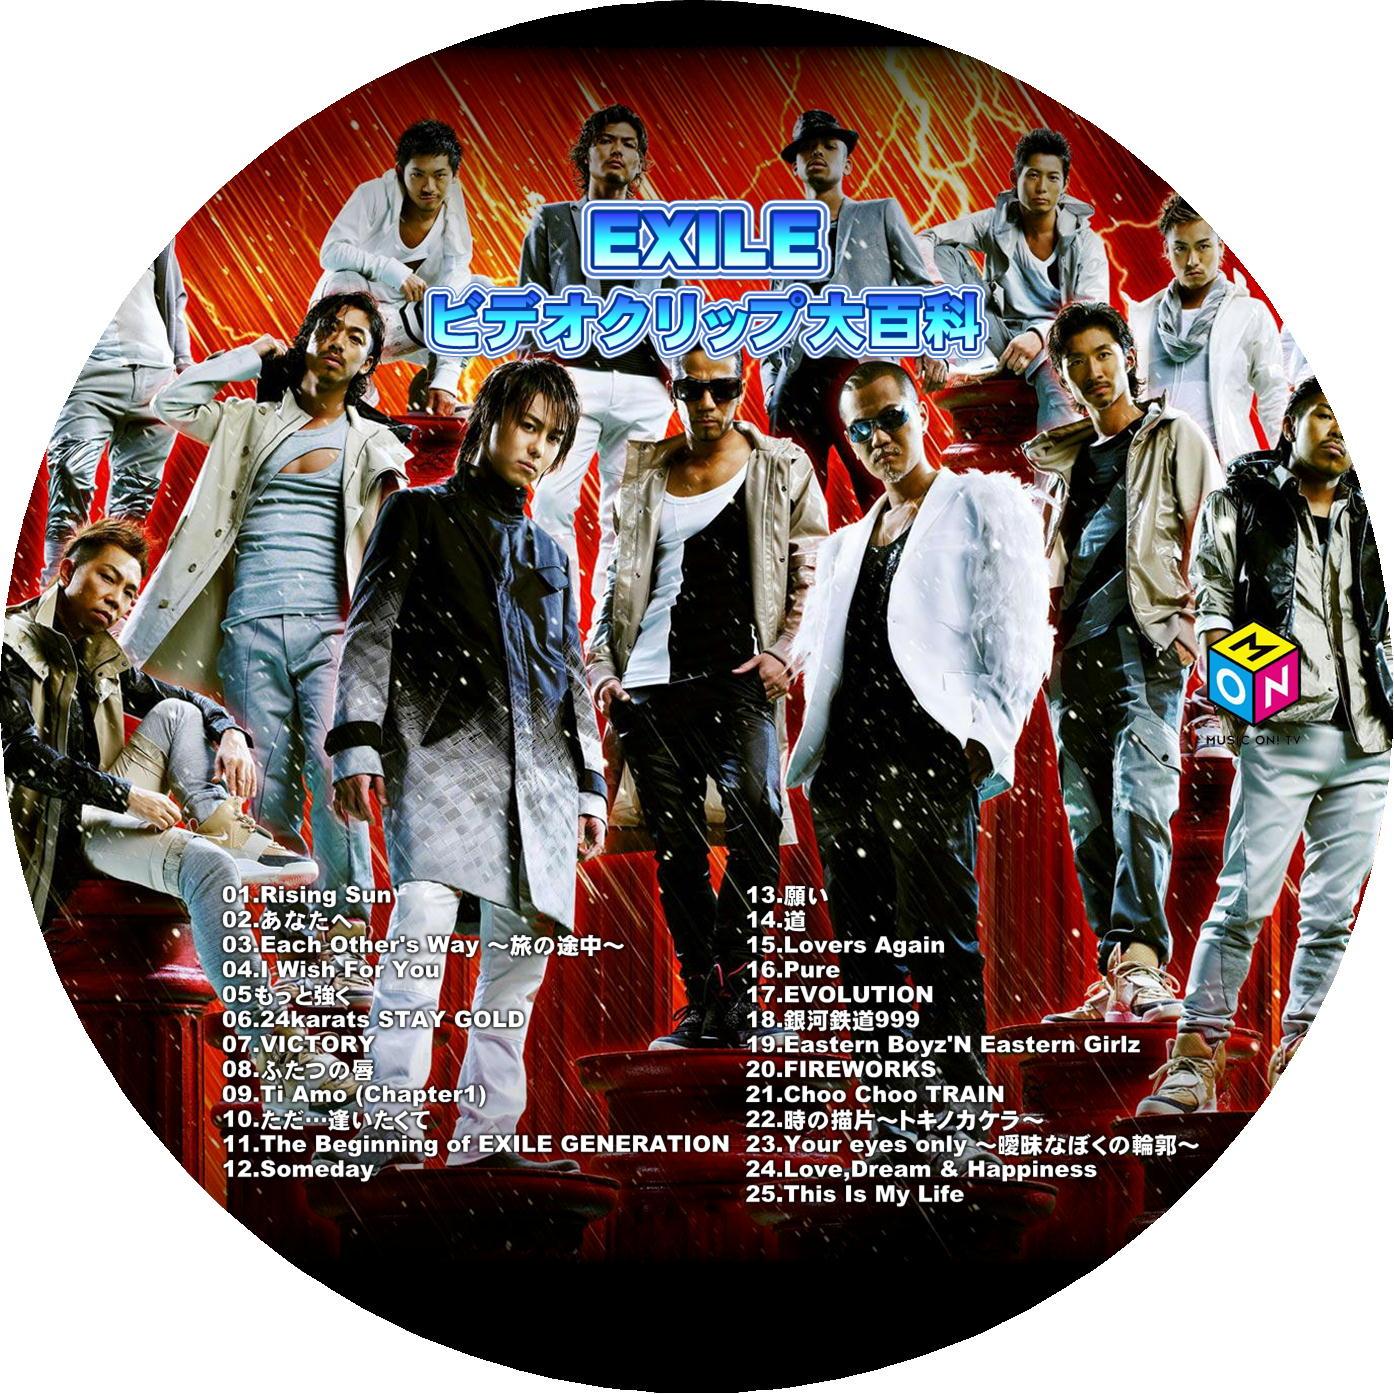 EXILE ビデオクリップ大百科 DVDラベル